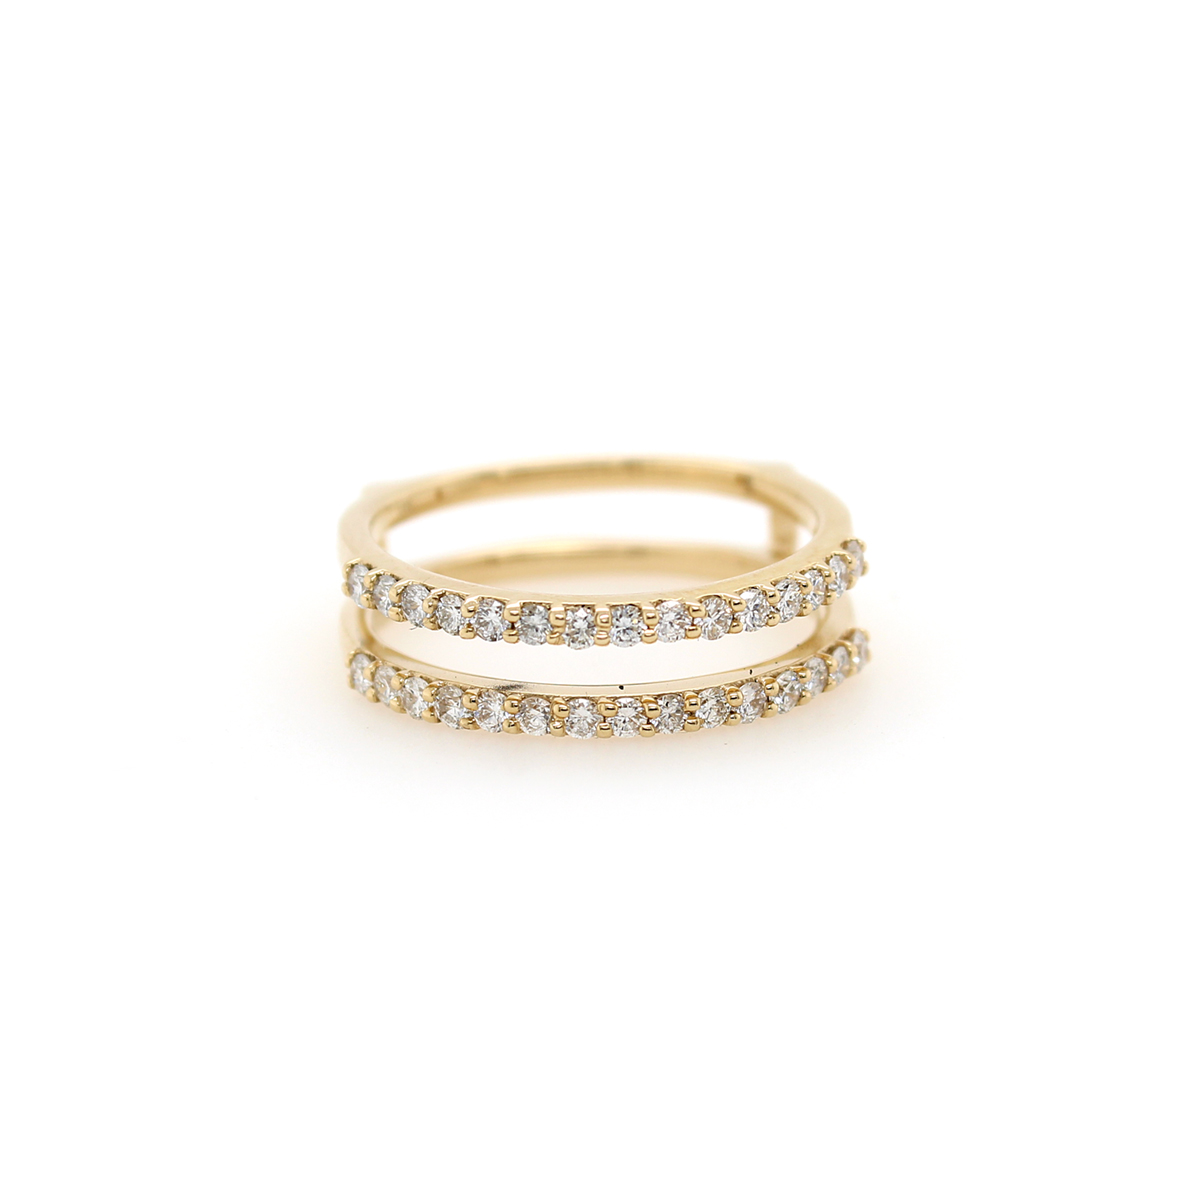 Shefi Diamonds 14 Karat Yellow Gold .5 Carat Diamond Ring Jacket